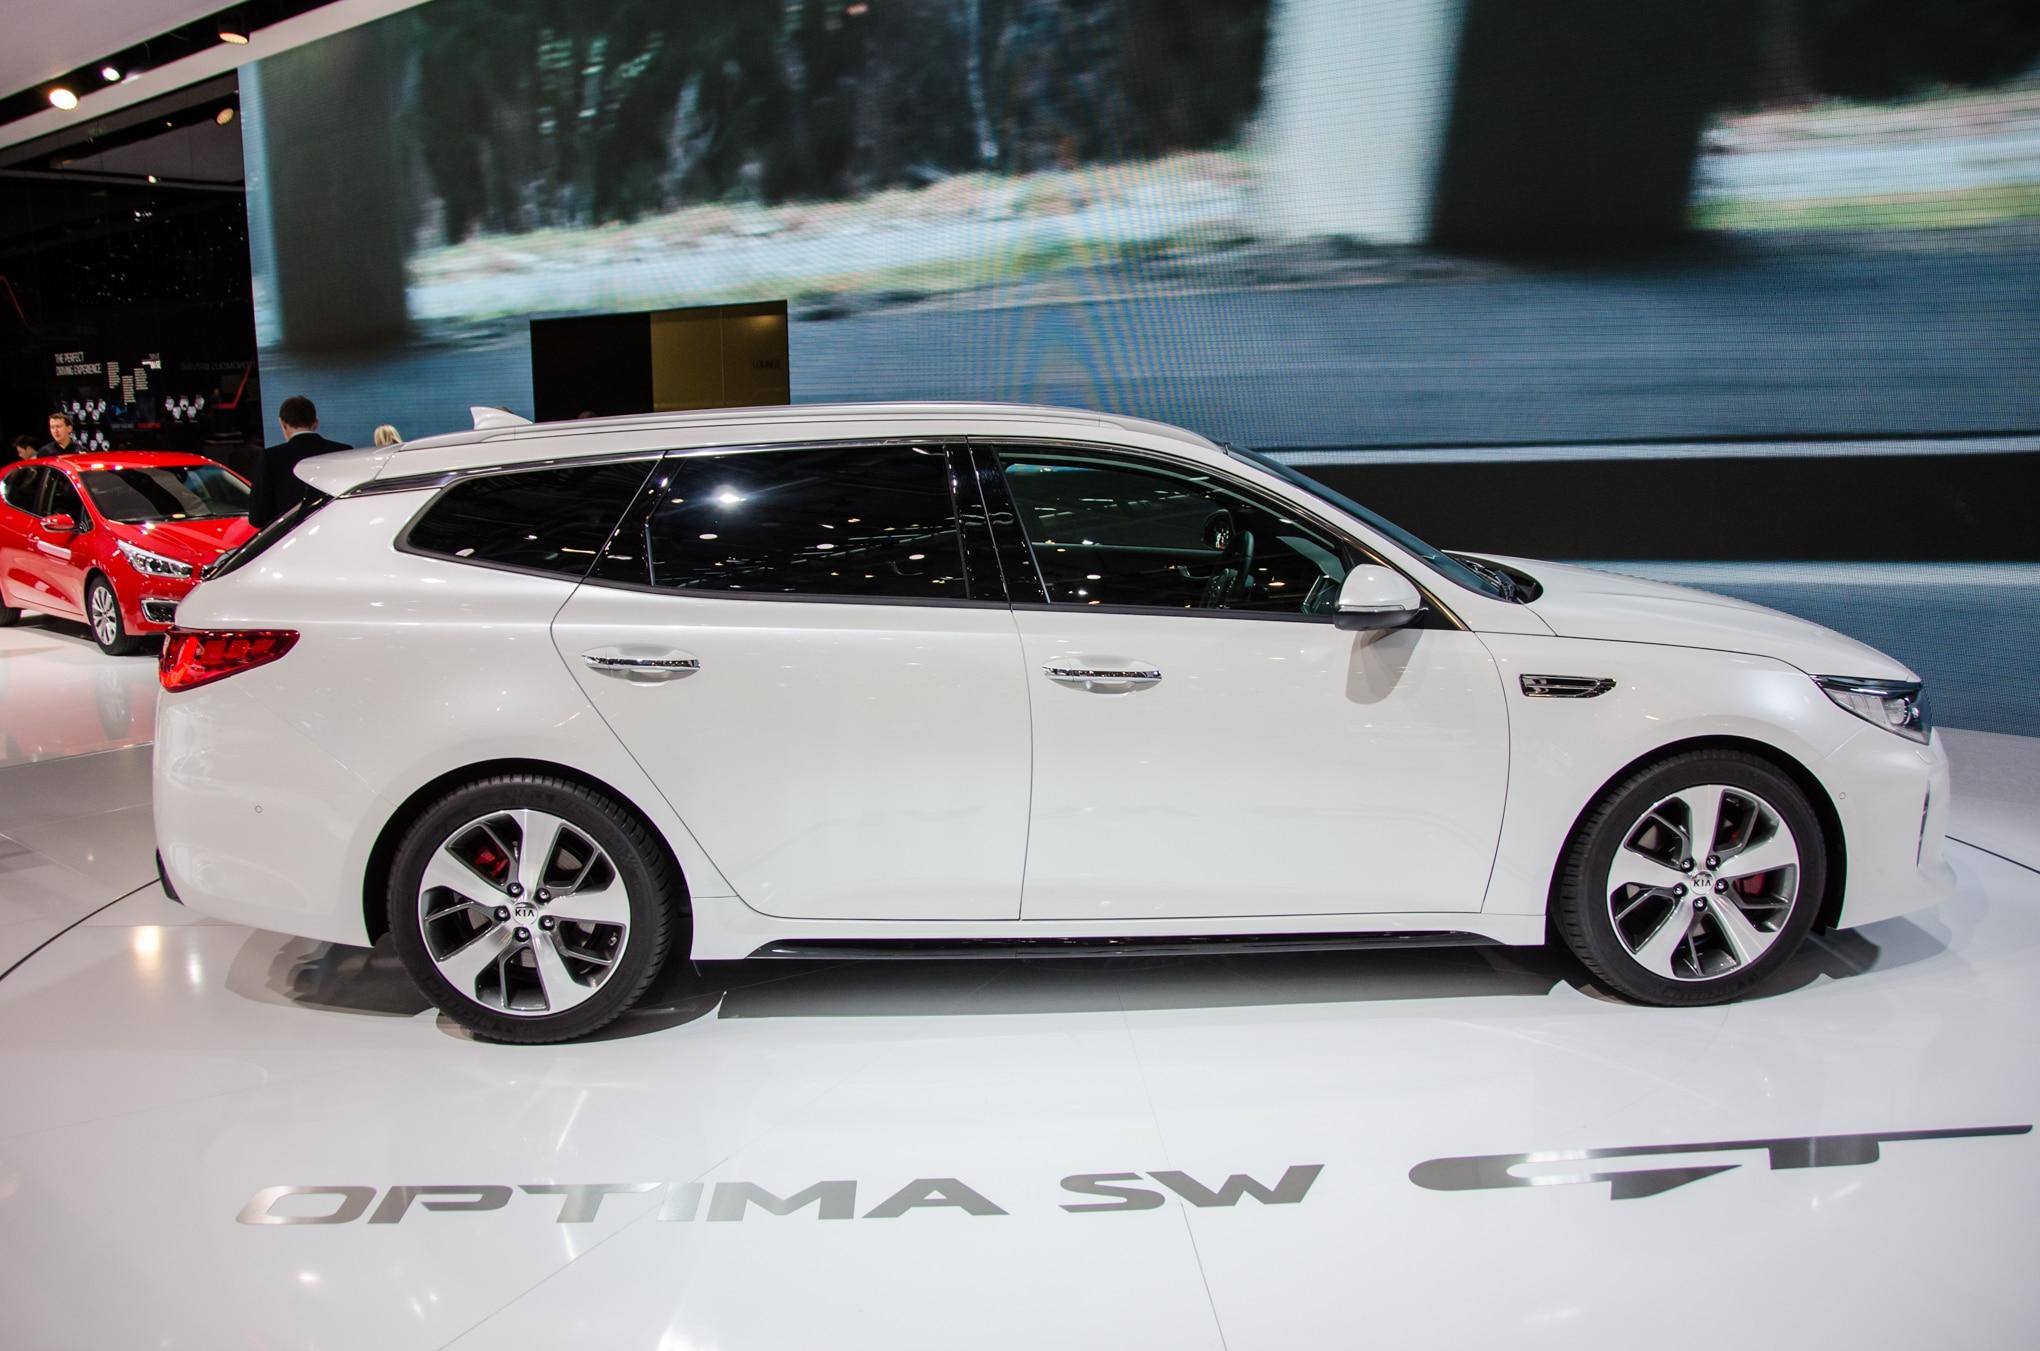 The Kia Optima Sportswagon Is More Desirable than Any Crossover | Automobile Magazine